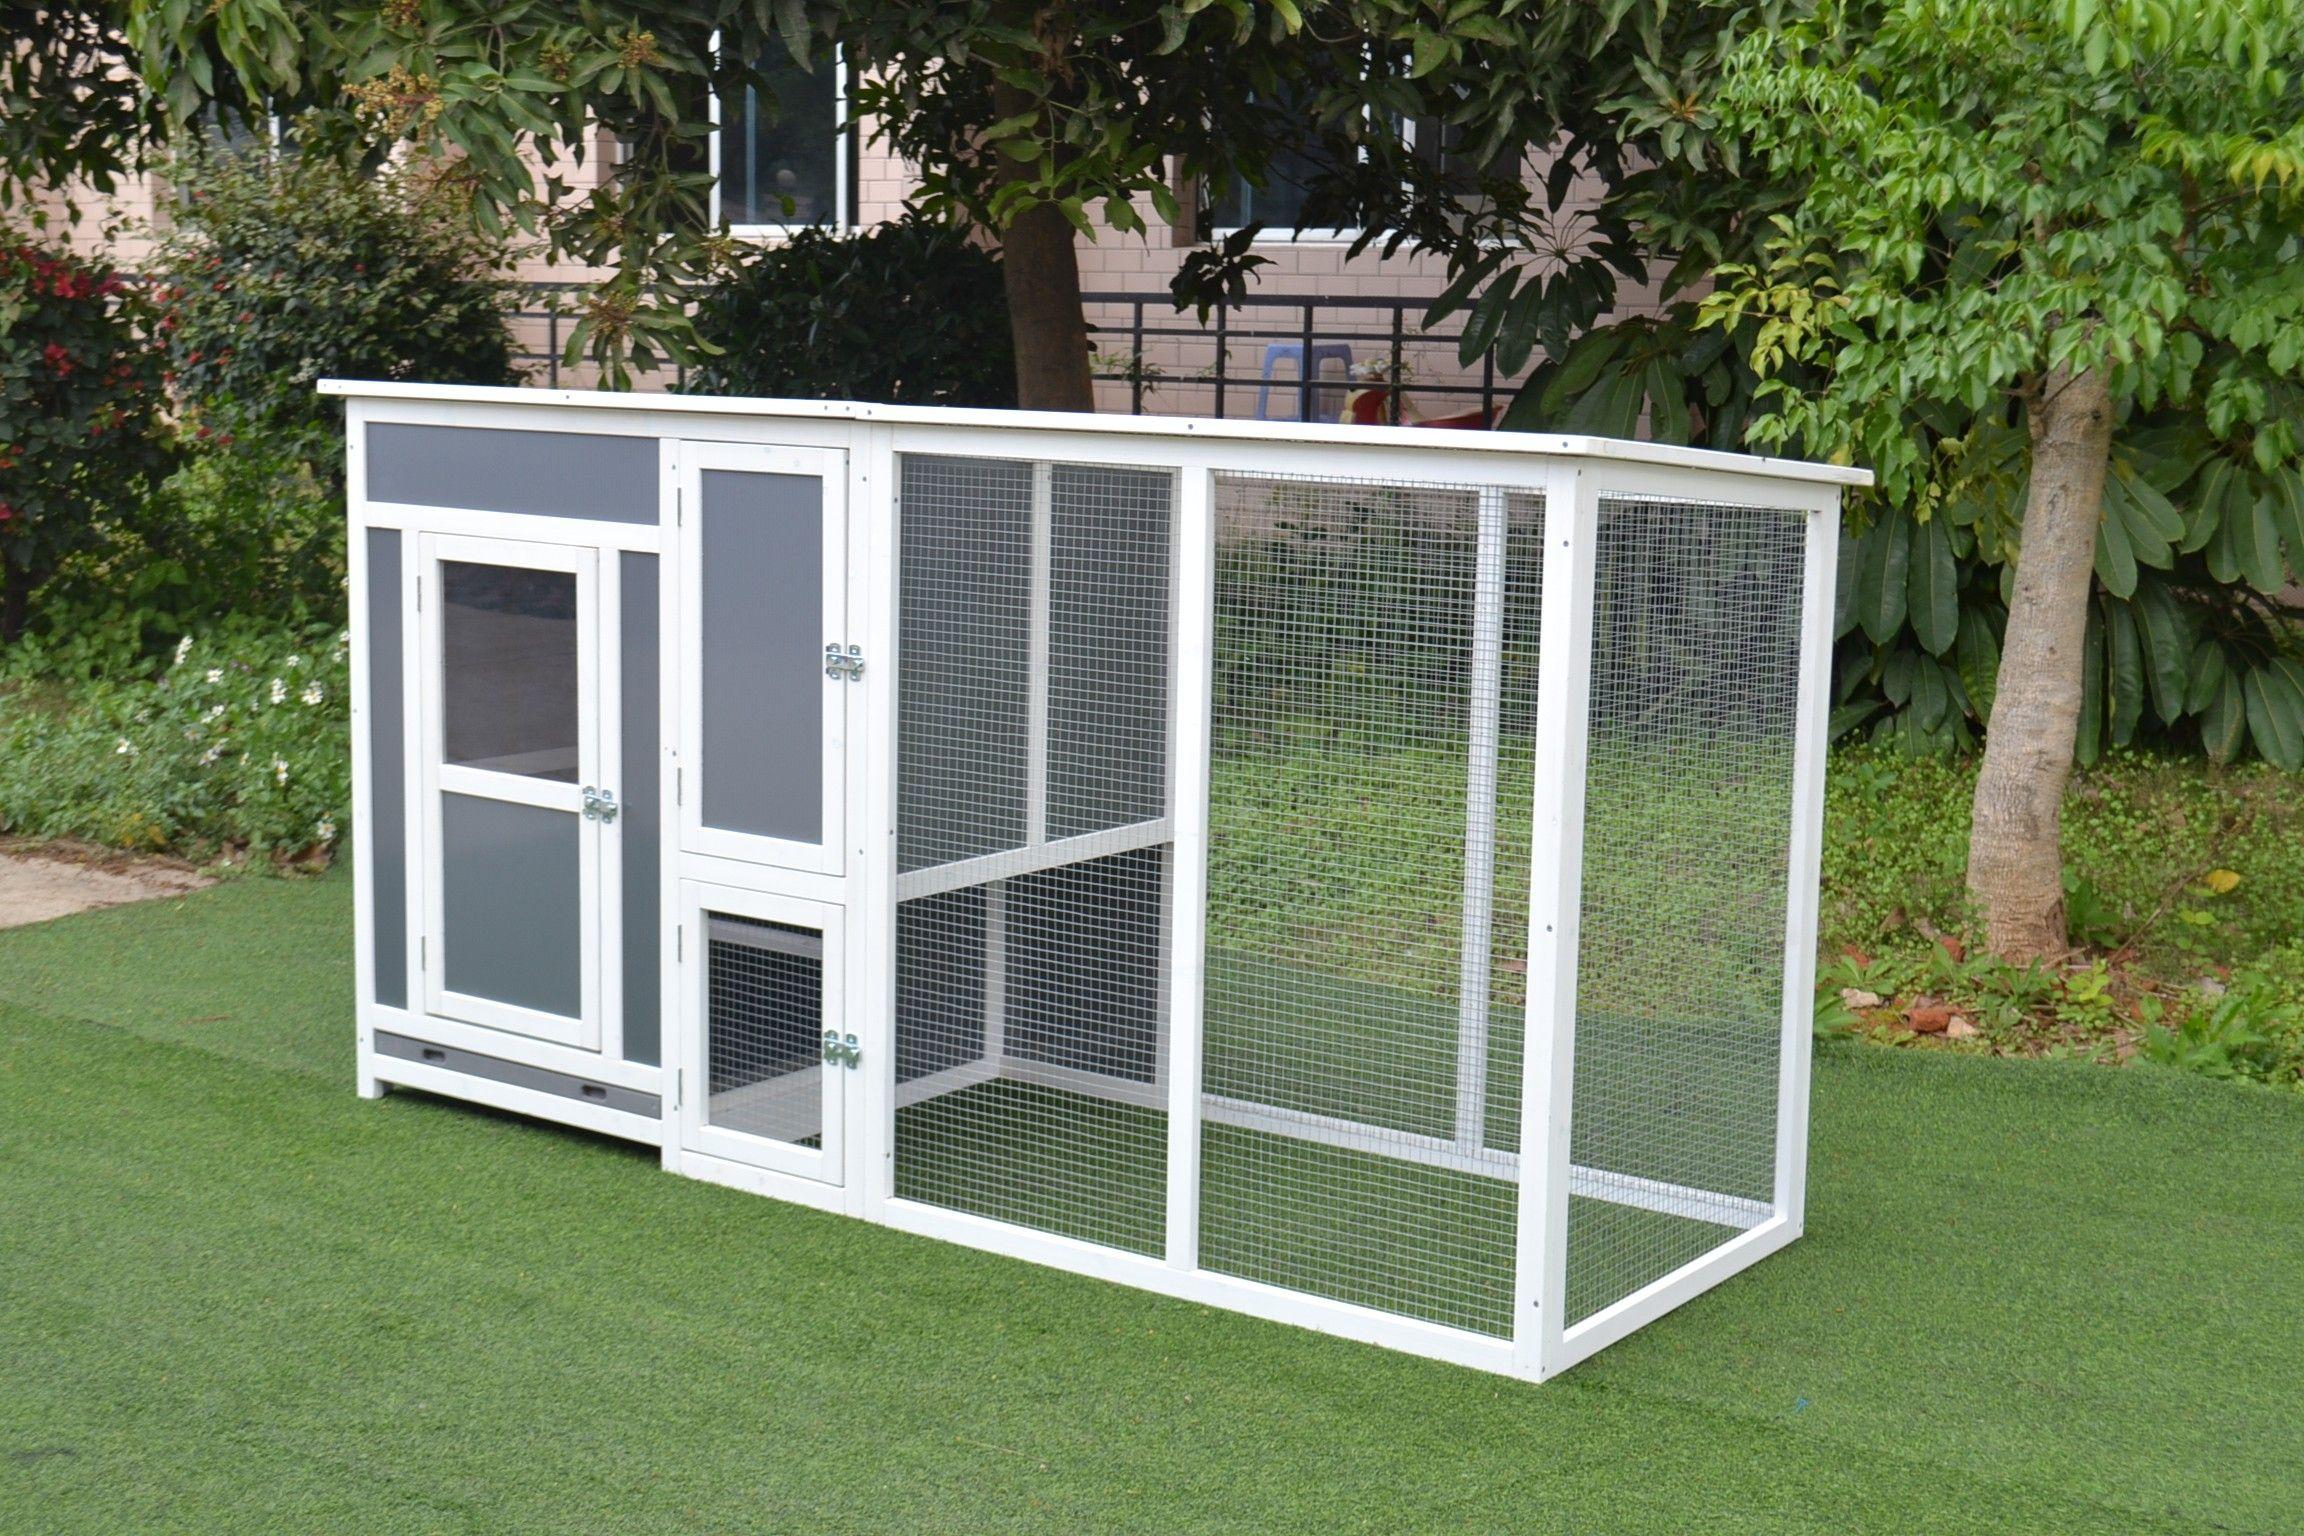 poulailler renforc jusqu 39 4 poules animal. Black Bedroom Furniture Sets. Home Design Ideas